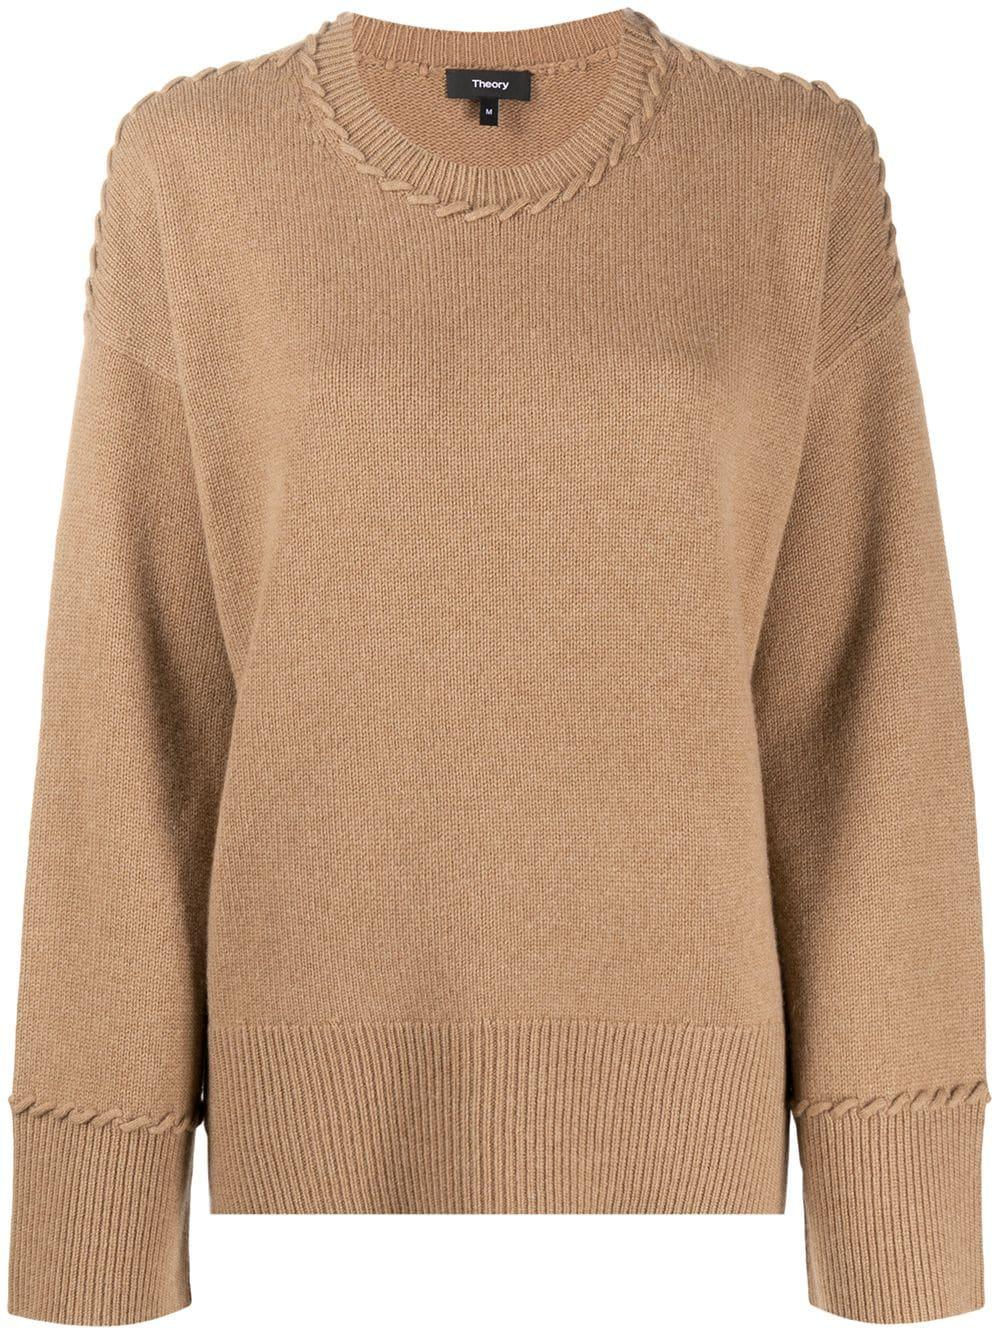 Karenia Oversized Cashmere Sweater Item # K0818705